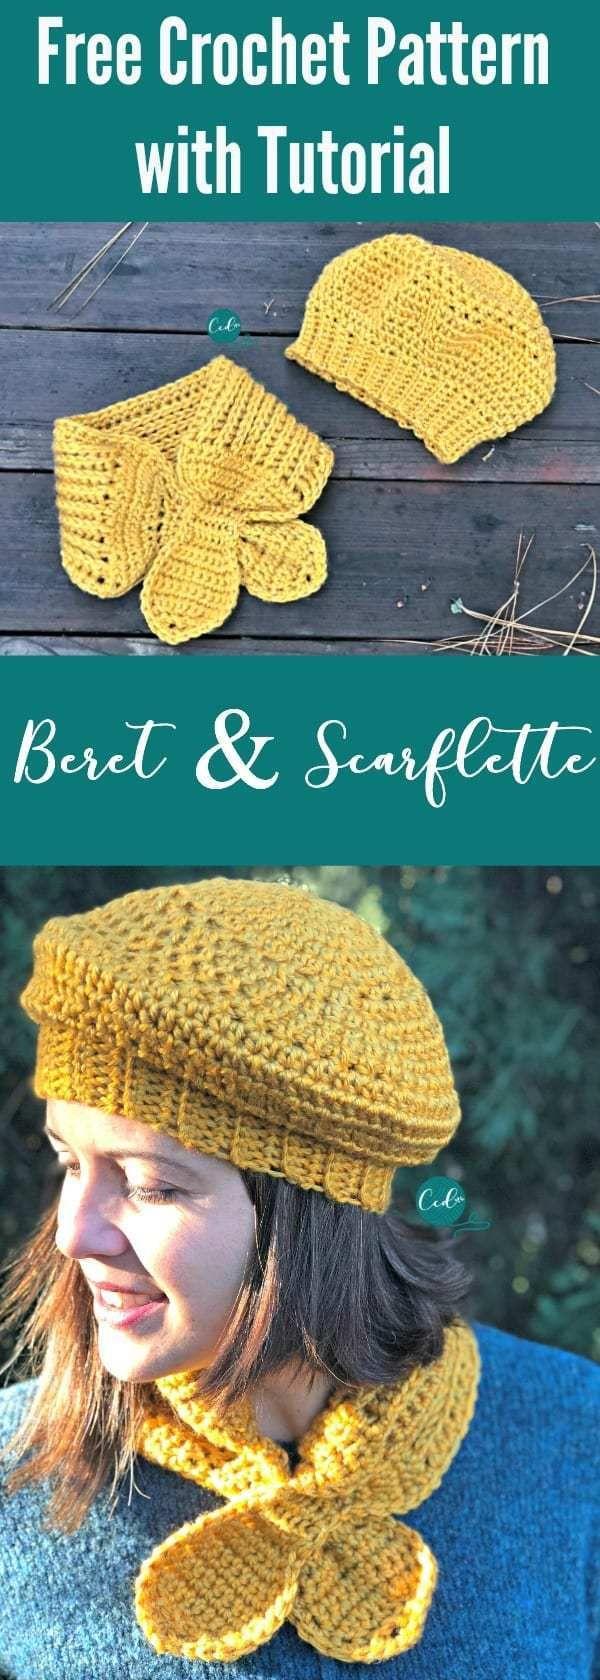 Crochet Beret and Scarflette Set Free Pattern